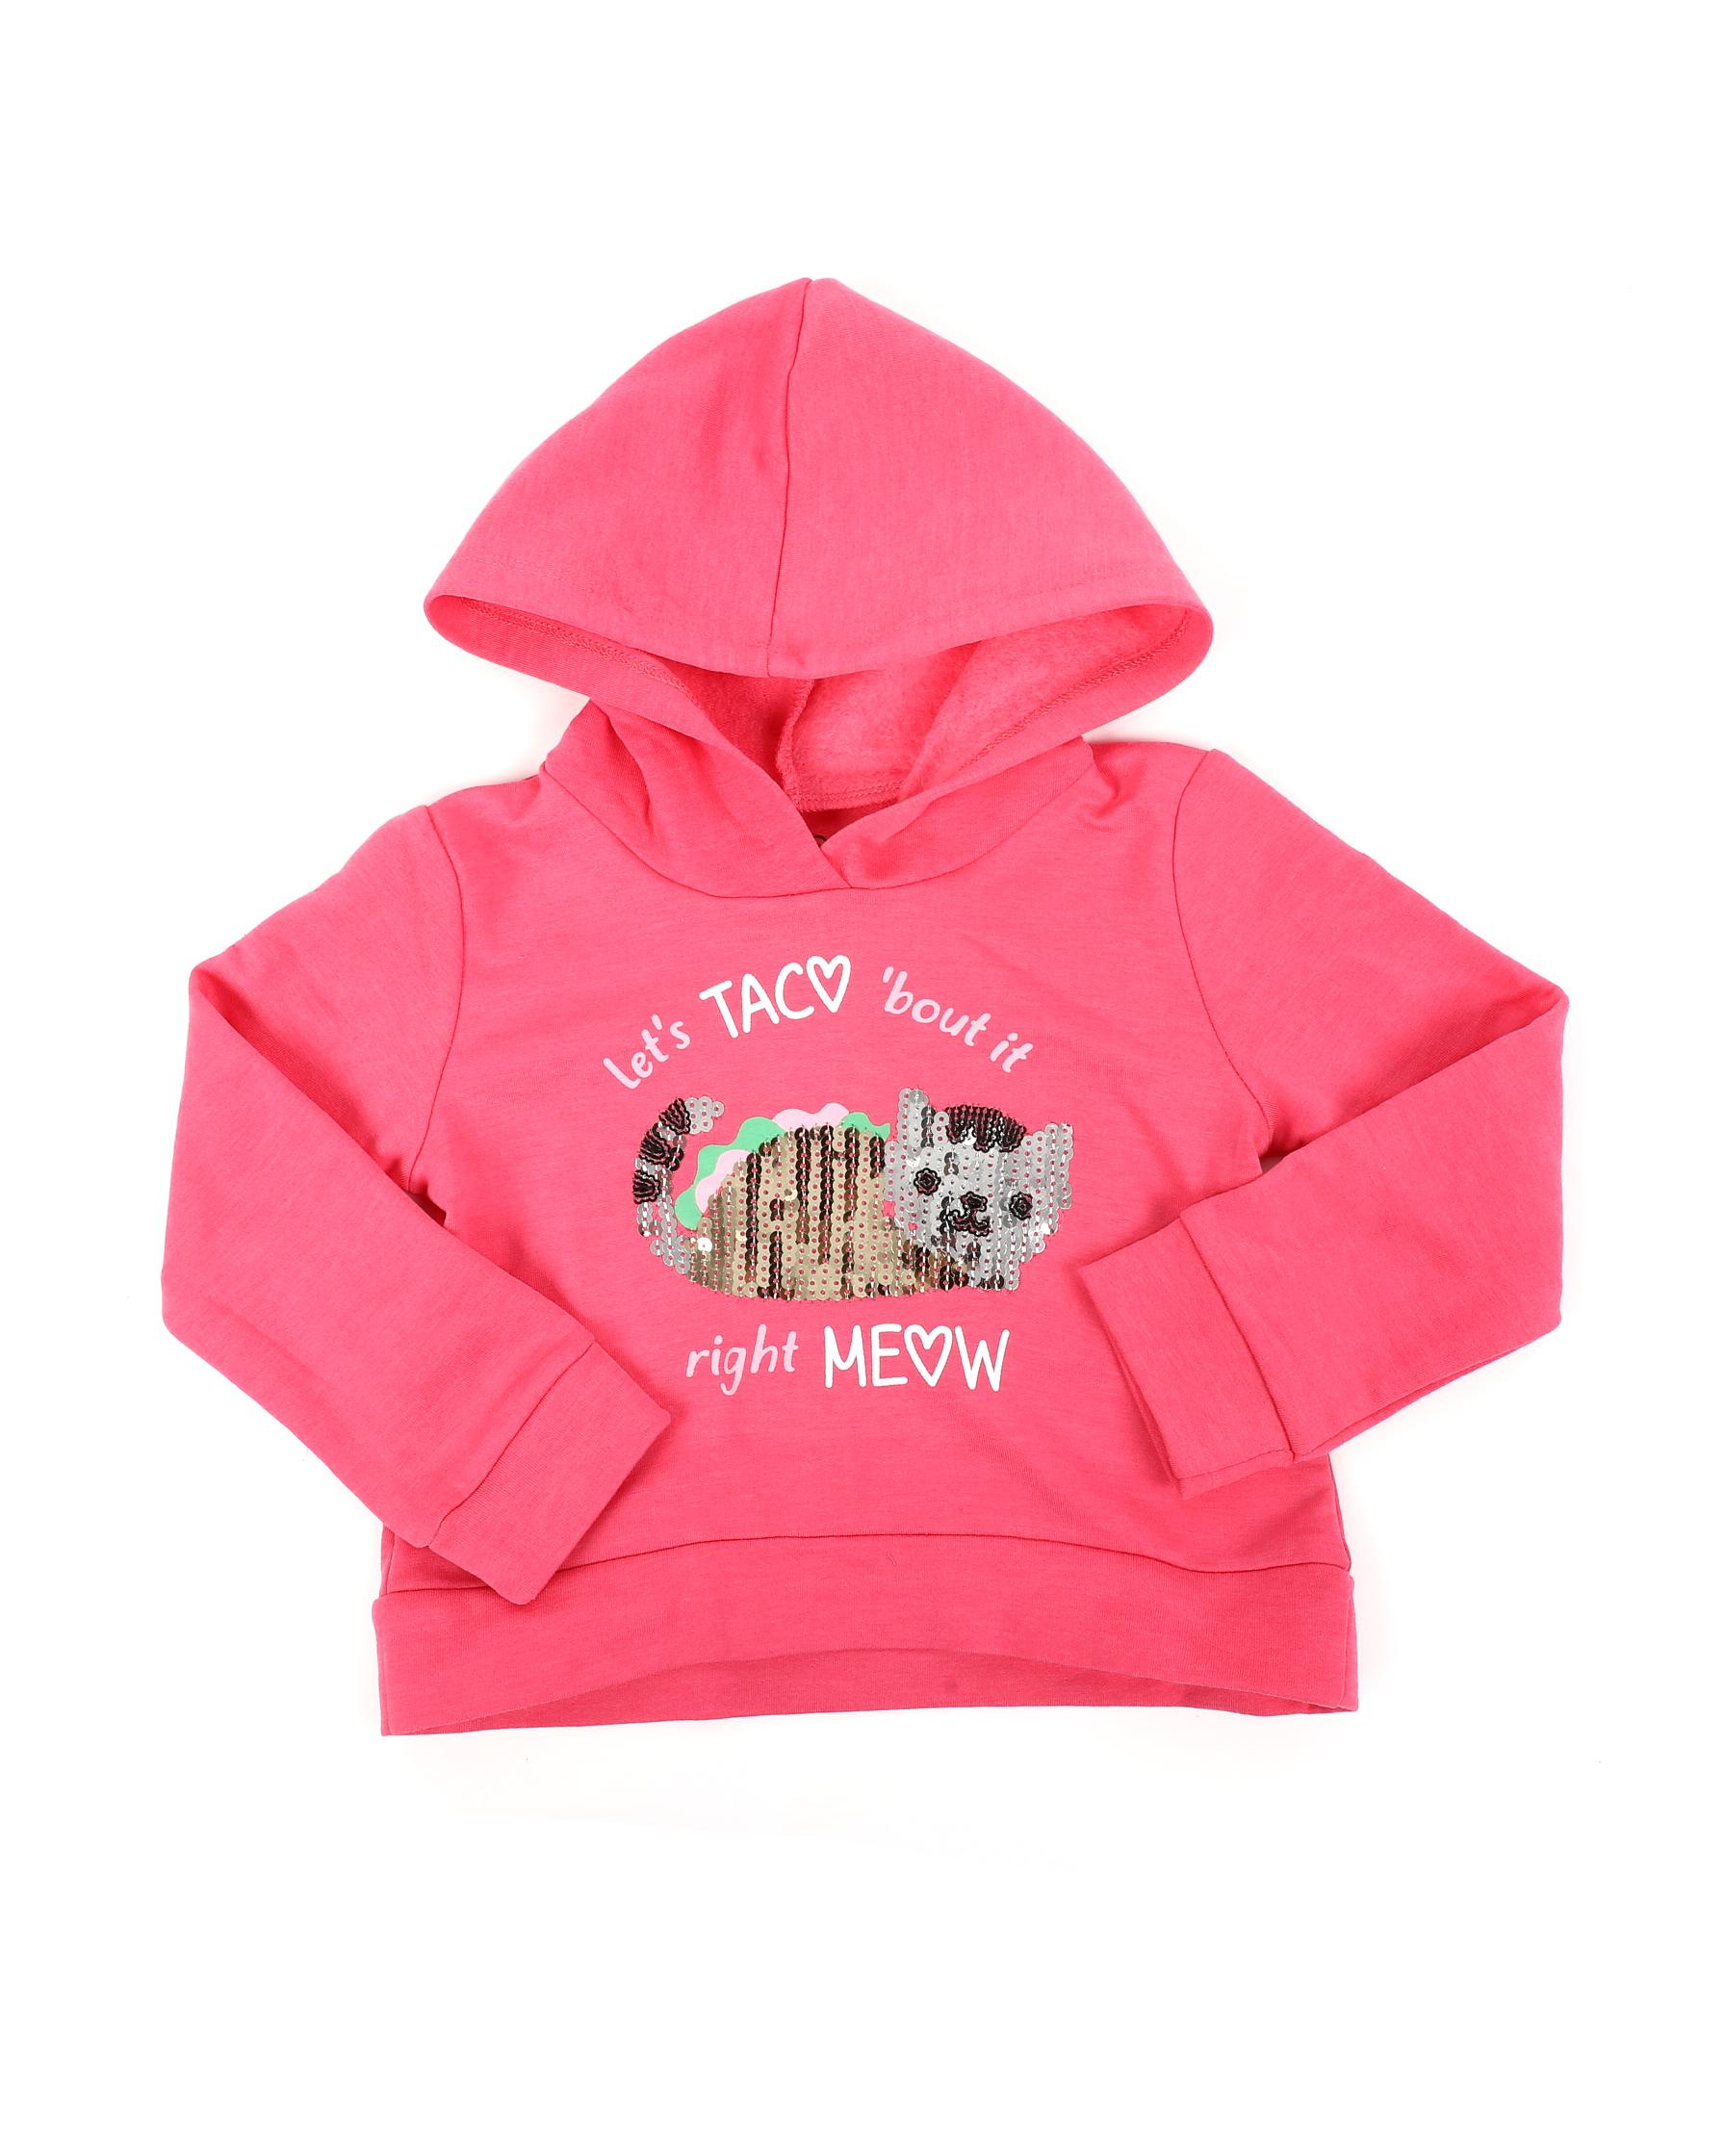 Reebok Toddler Girls/' Pullover Hoodie Azalea Pink 4T